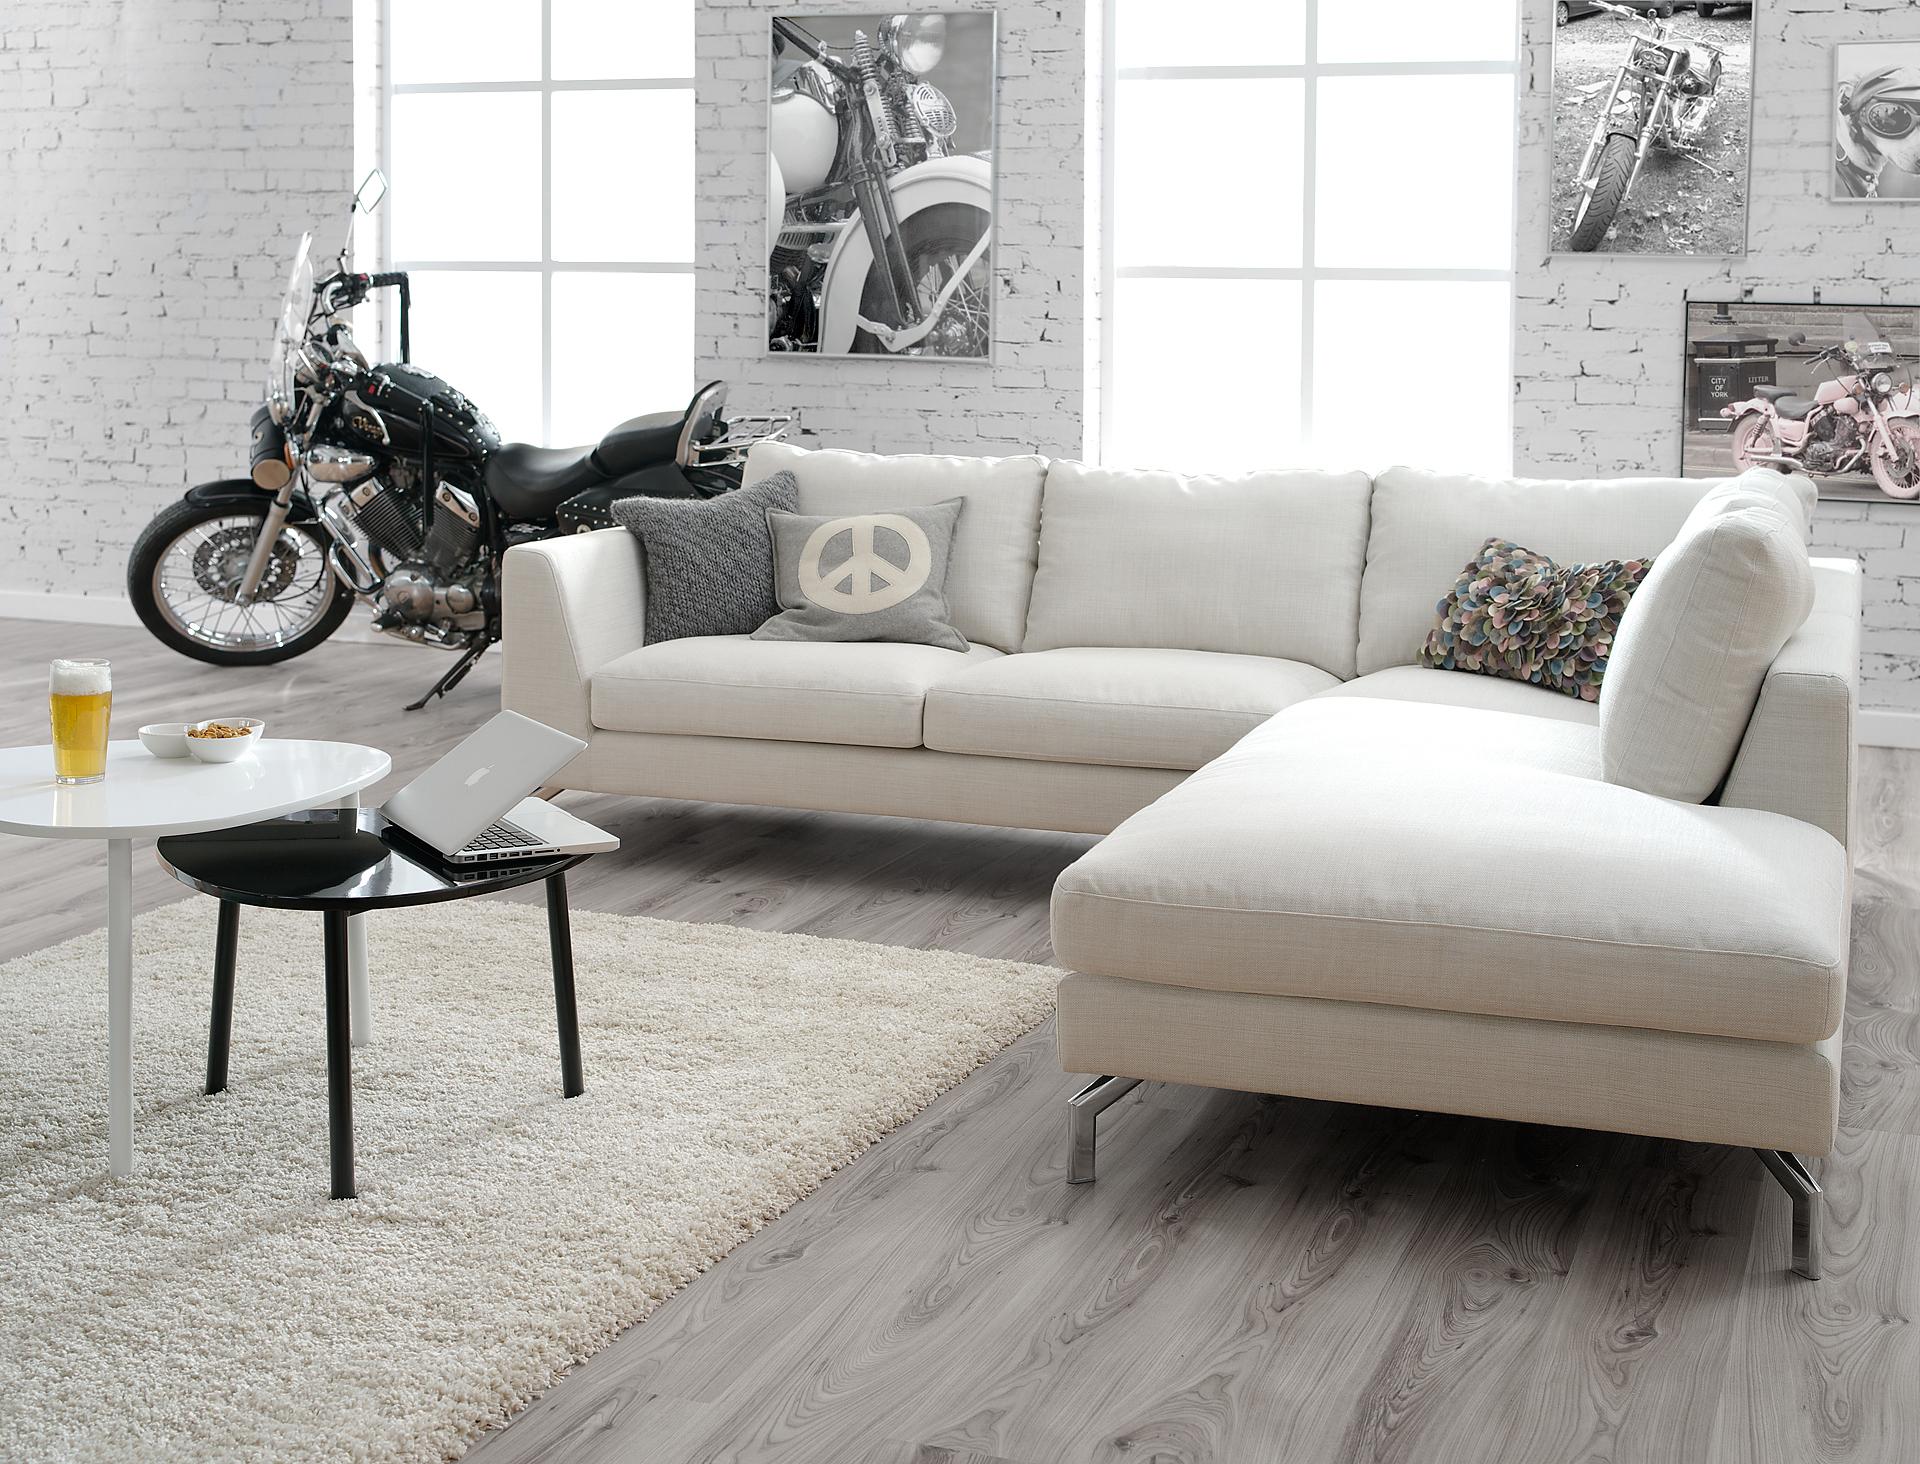 Allegra Set 1 Sofa With Chaiselongue-30182